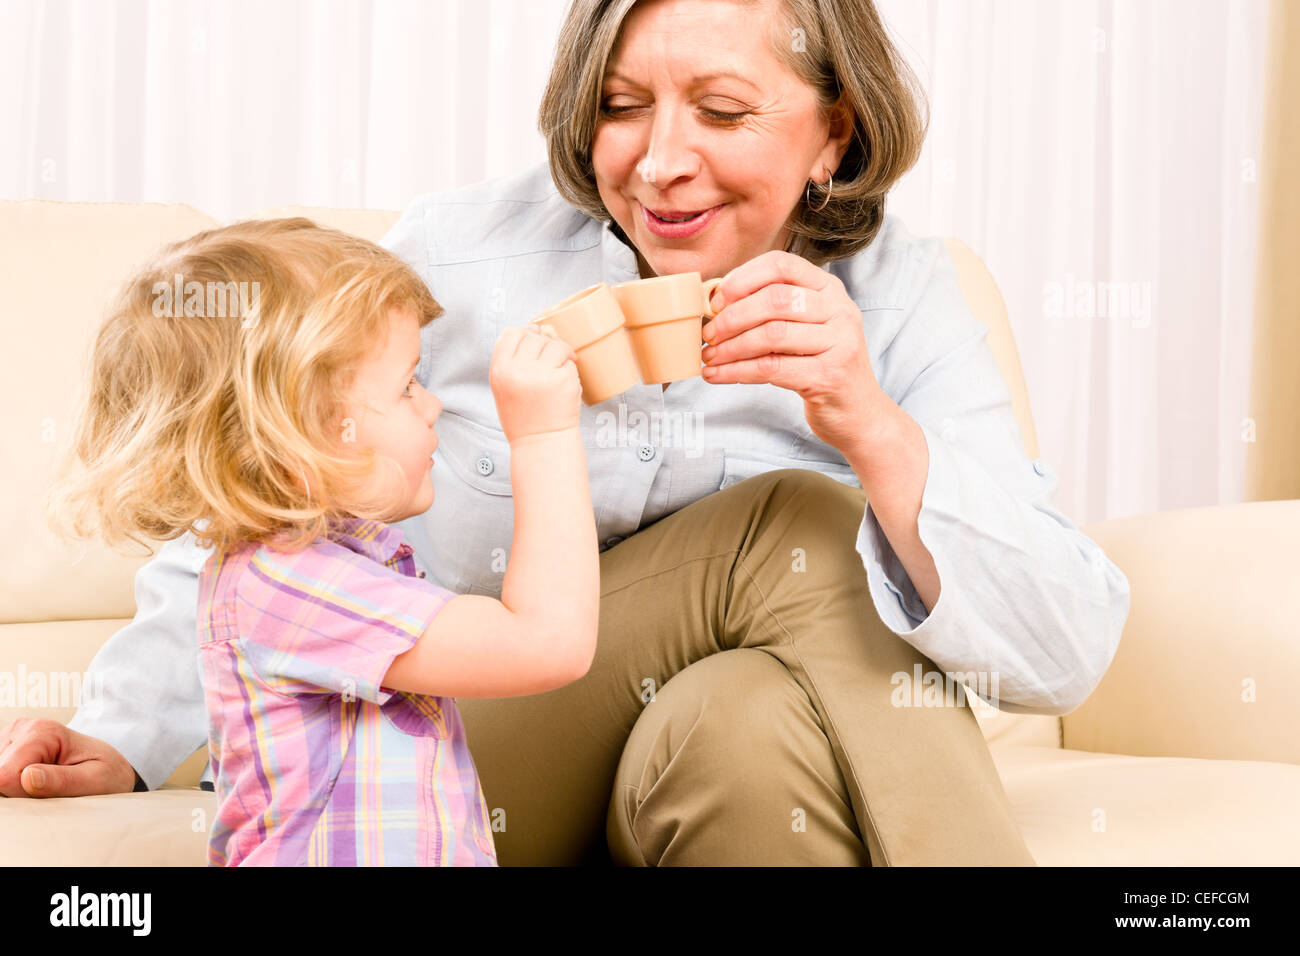 who-grandma-sand-teen-girl-granny-milf